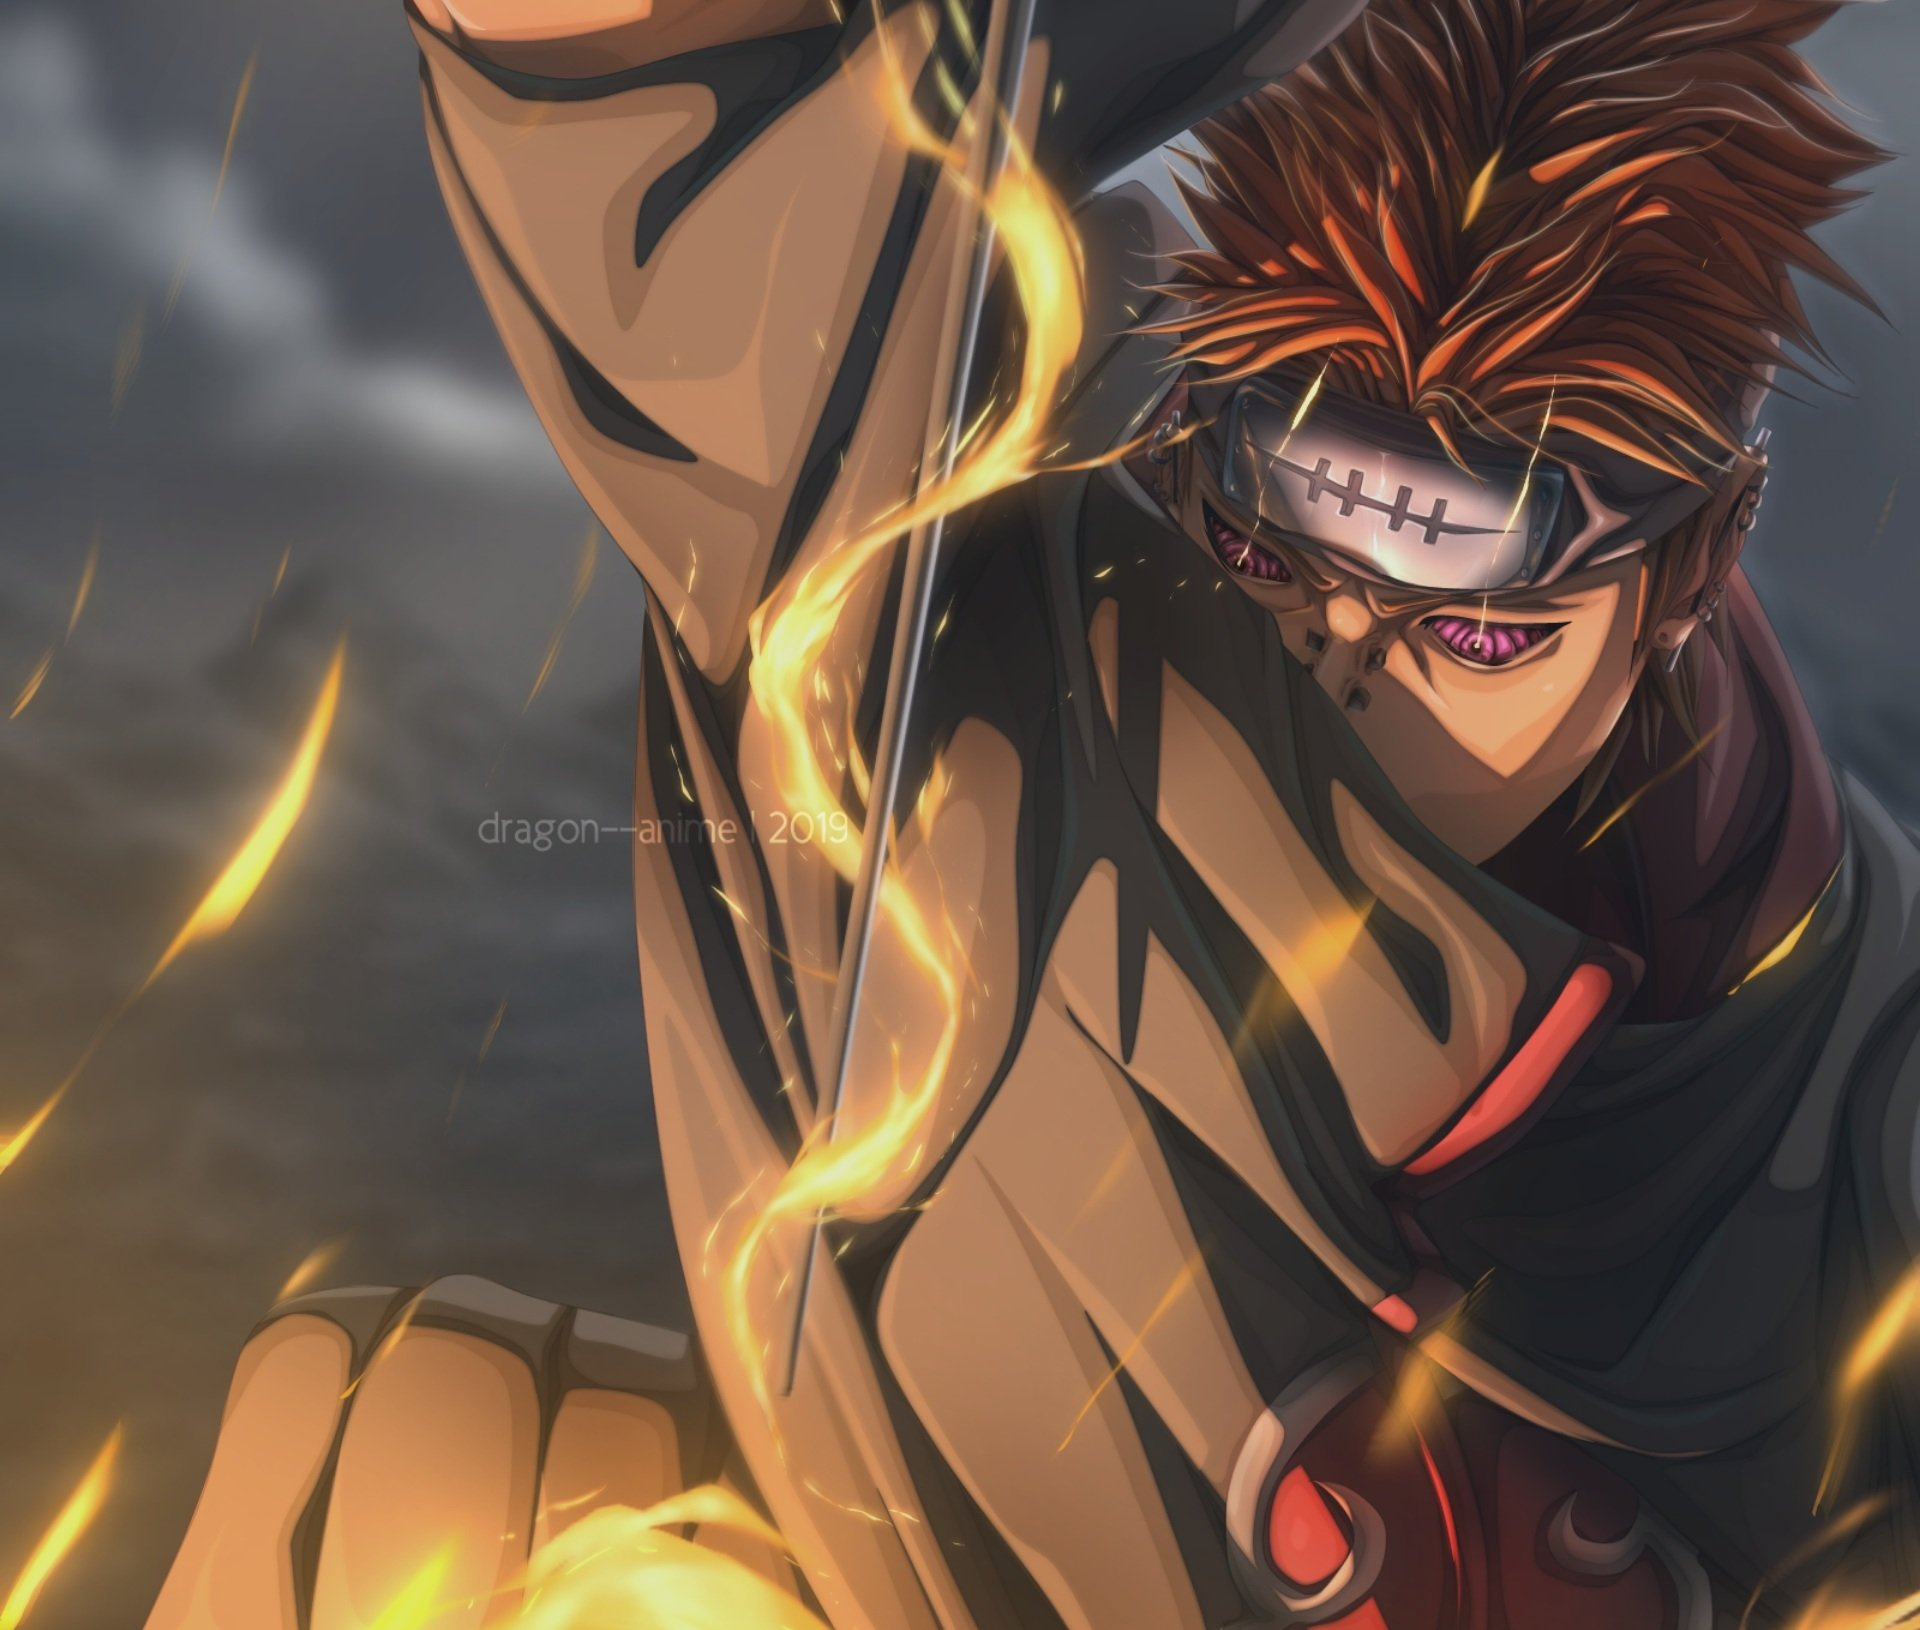 Pain Naruto Wallpaper: Naruto HD Wallpaper